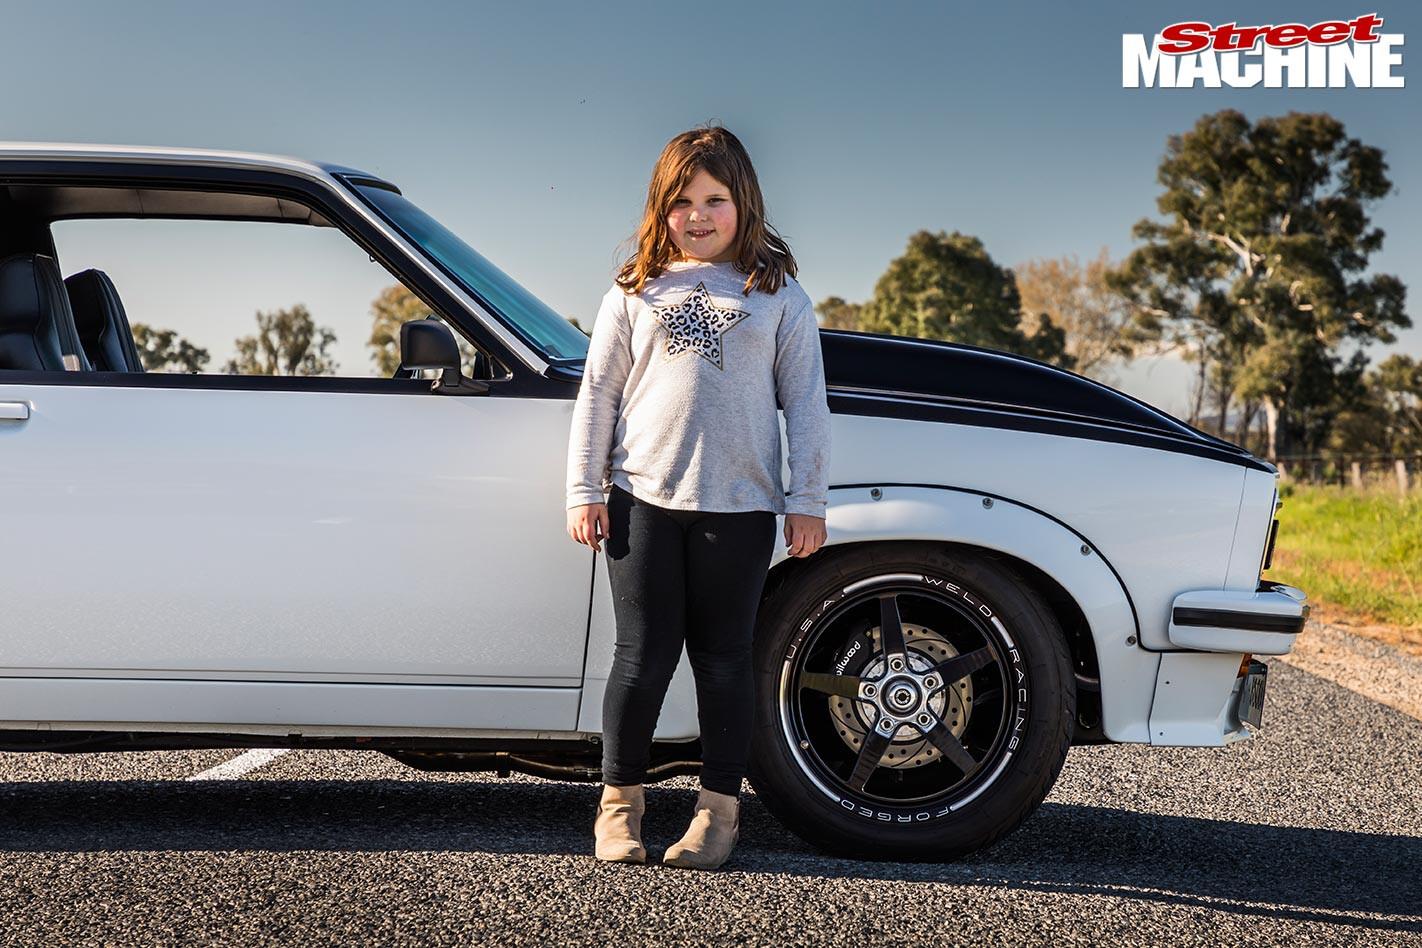 Holden Torana LX hatch